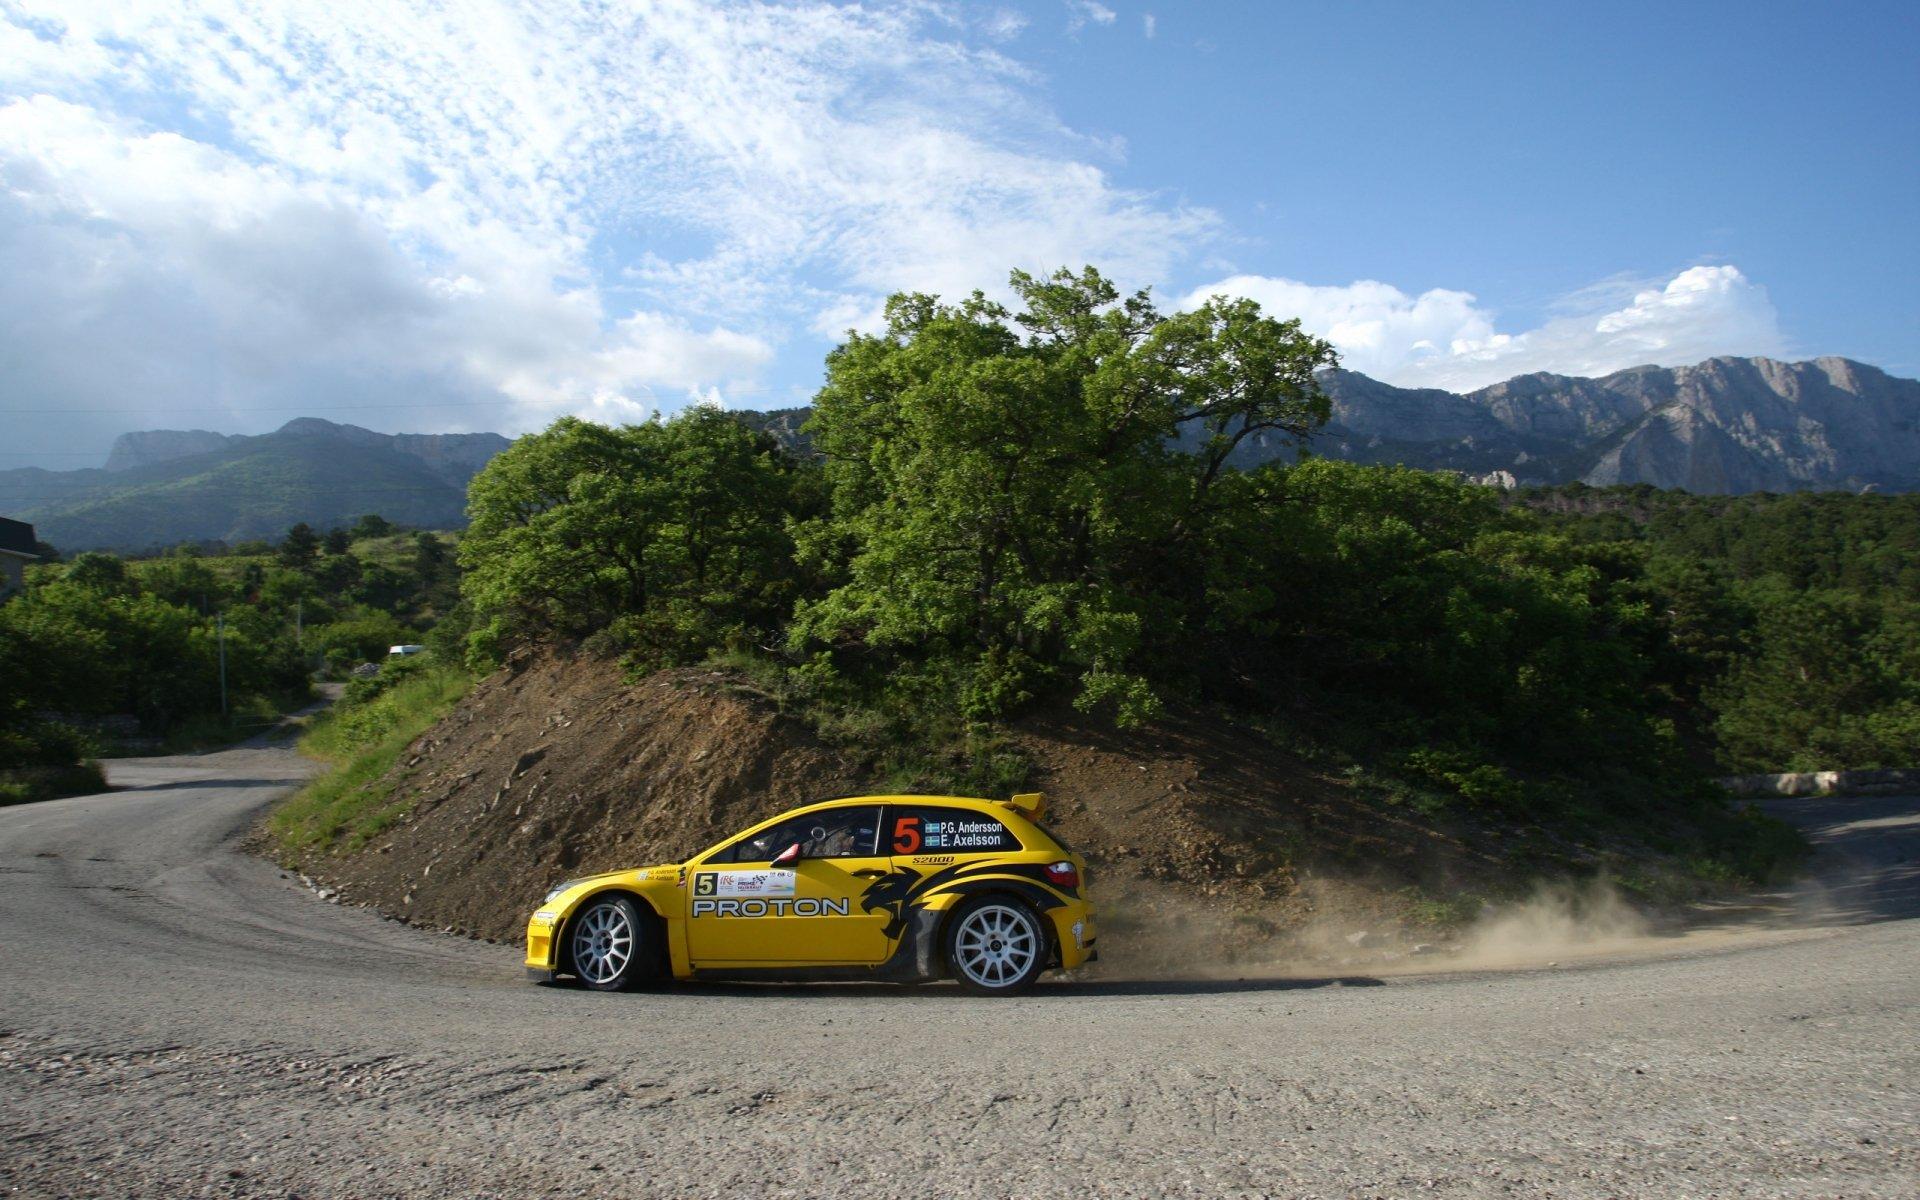 216 Rallye Fonds D Ecran Hd Arriere Plans Wallpaper Abyss Page 2